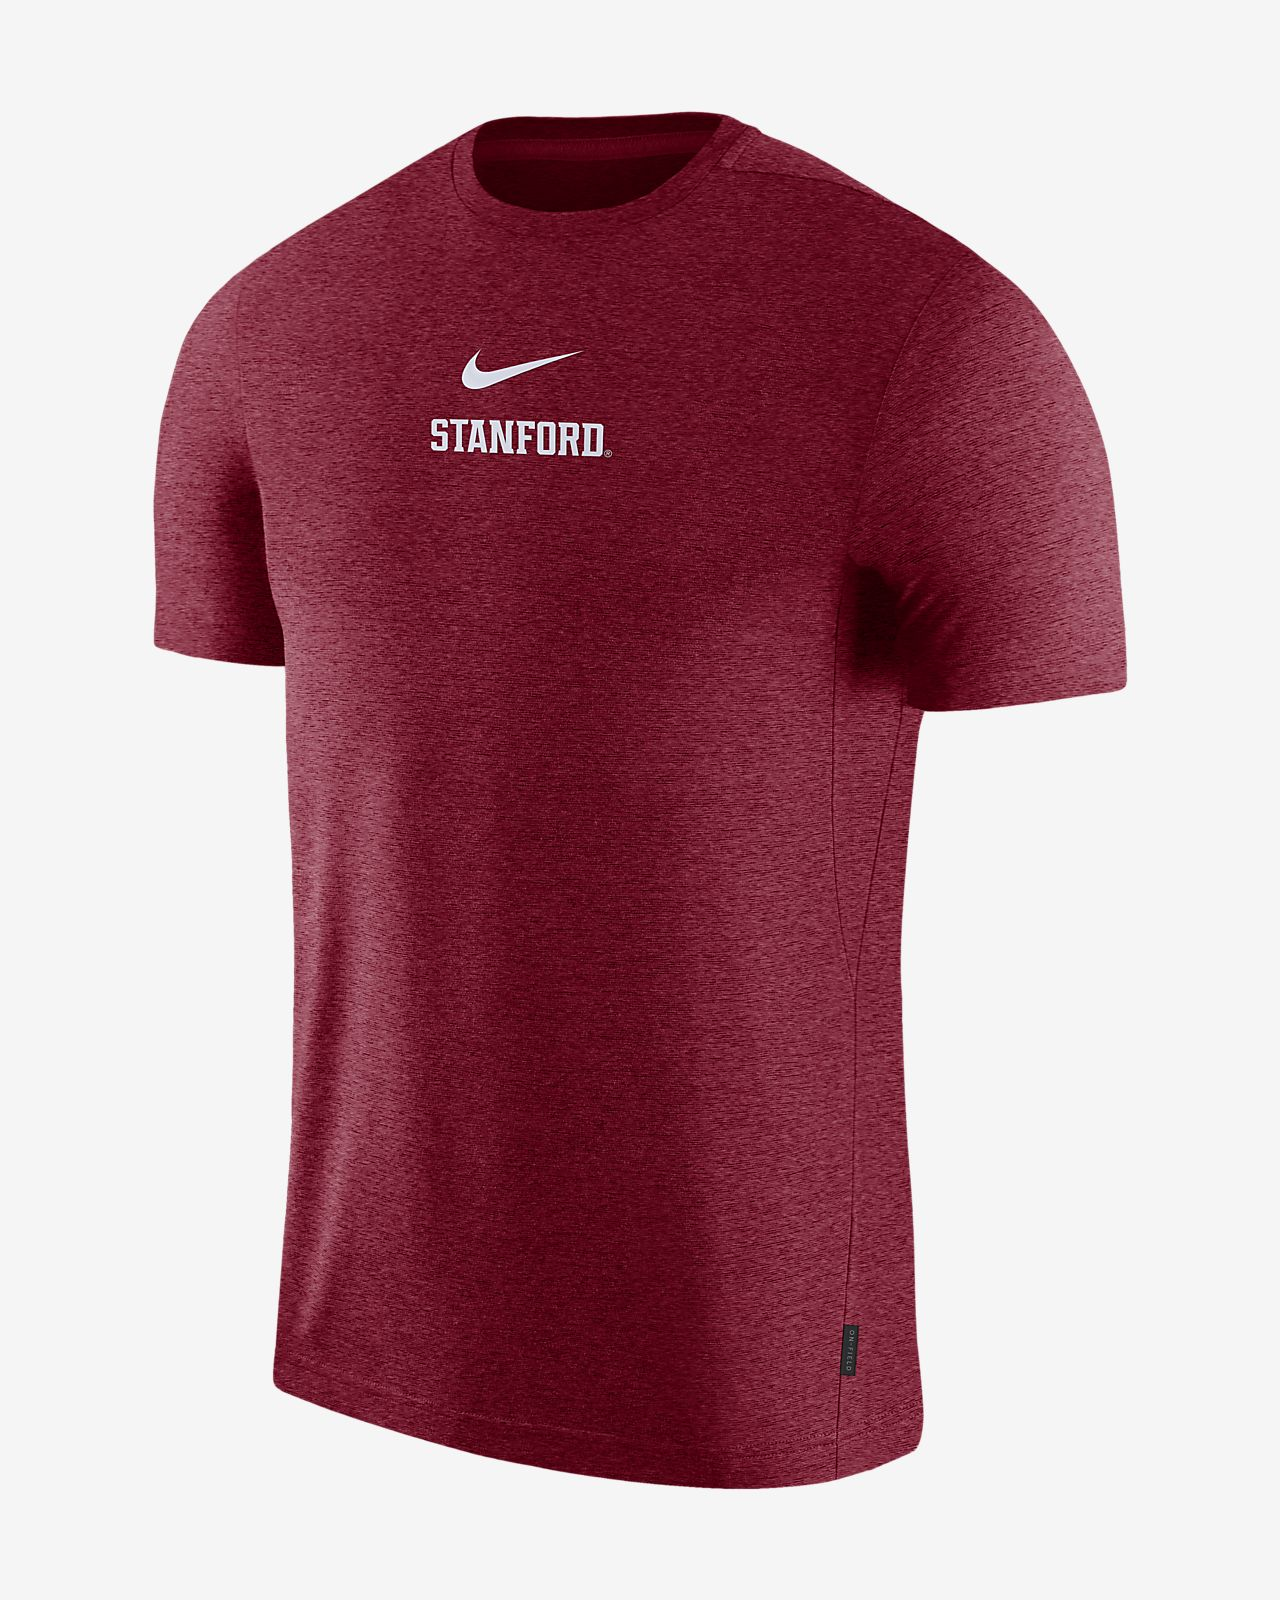 Nike College Dri-FIT Coach (Stanford) Men's Short-Sleeve Top